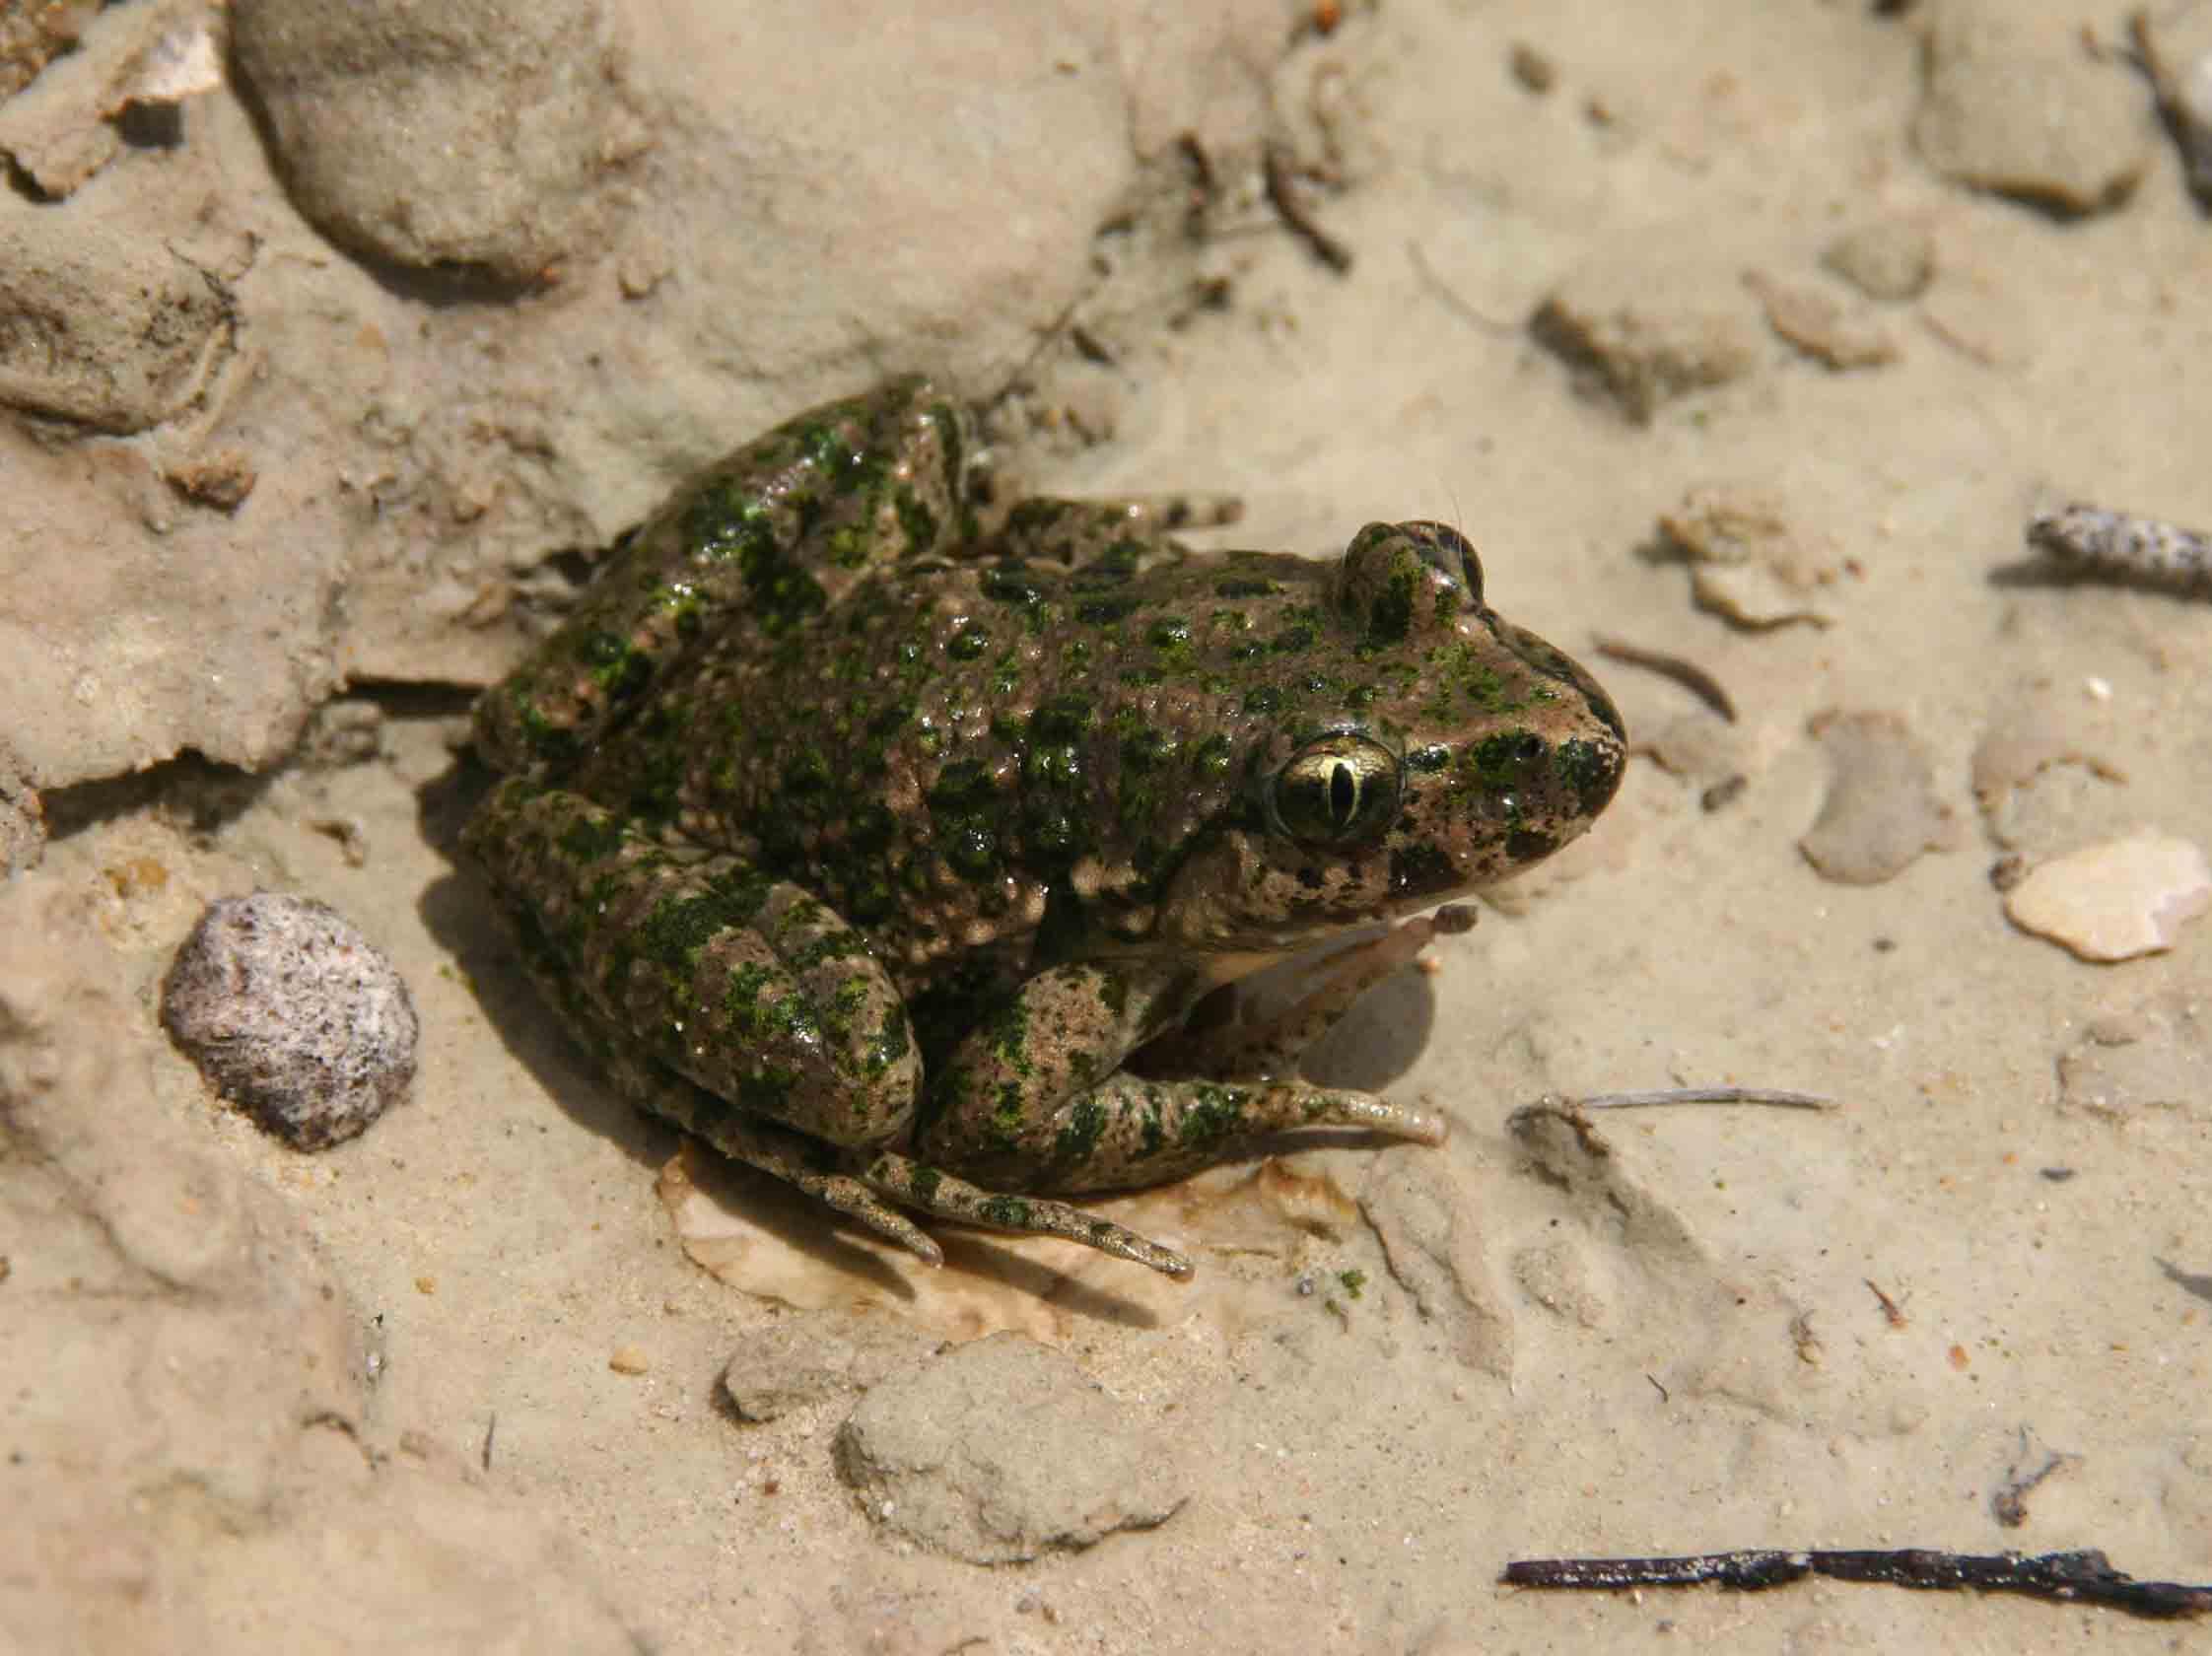 Parsley frog (Pelodytes punctatus)